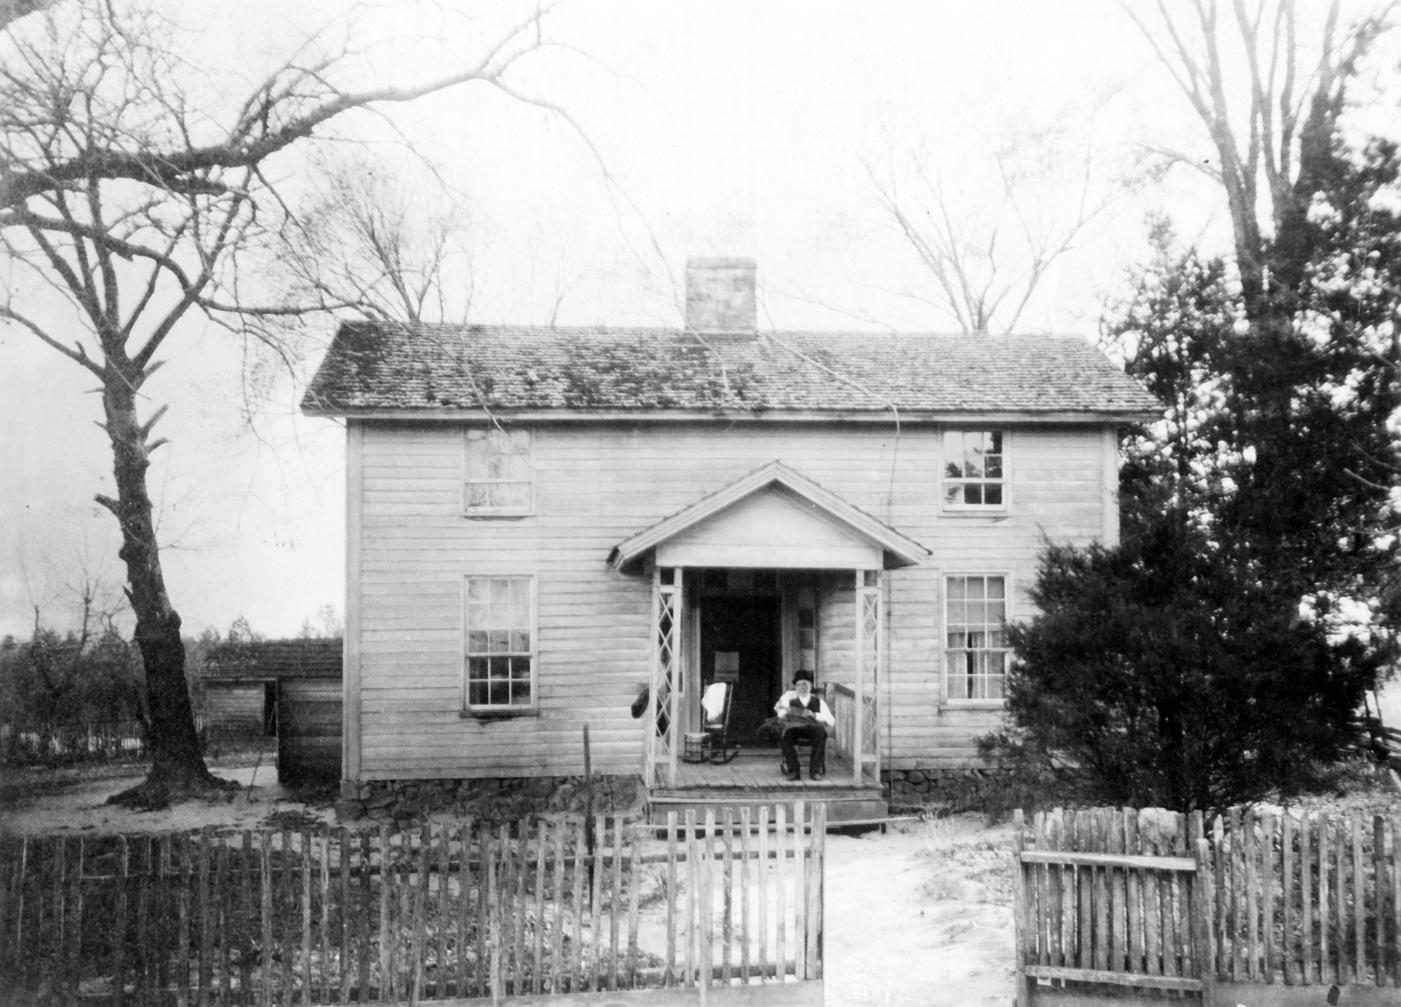 Washington Duke seated on the front porch of Duke Homestead farmhouse